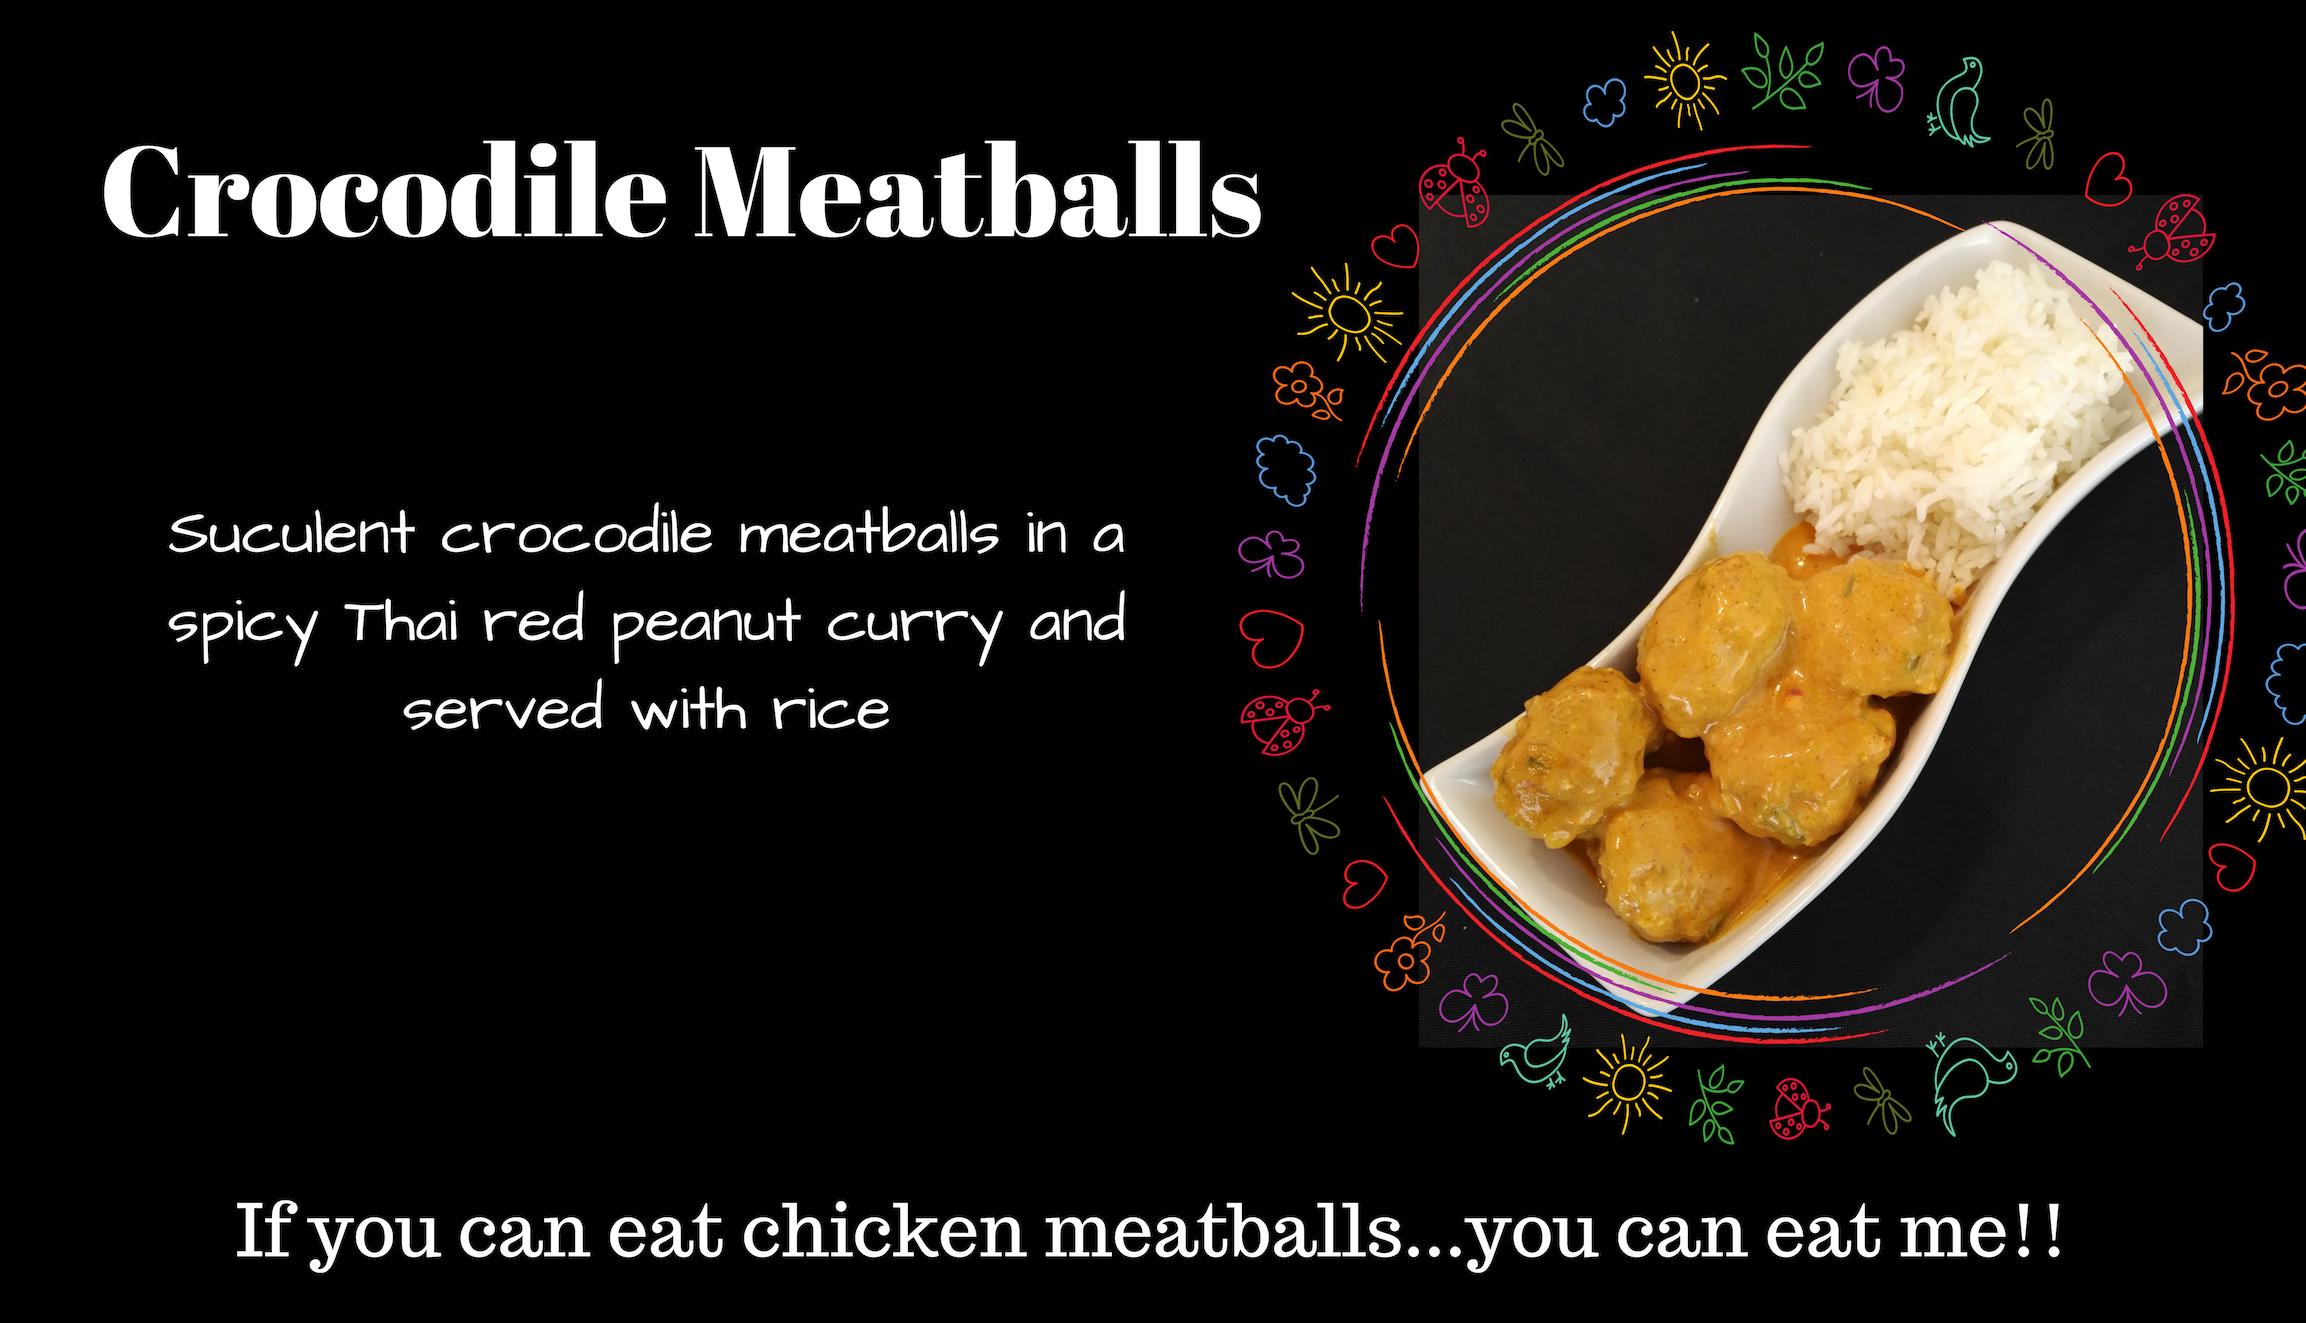 Crocodile Meatballs (FT).png